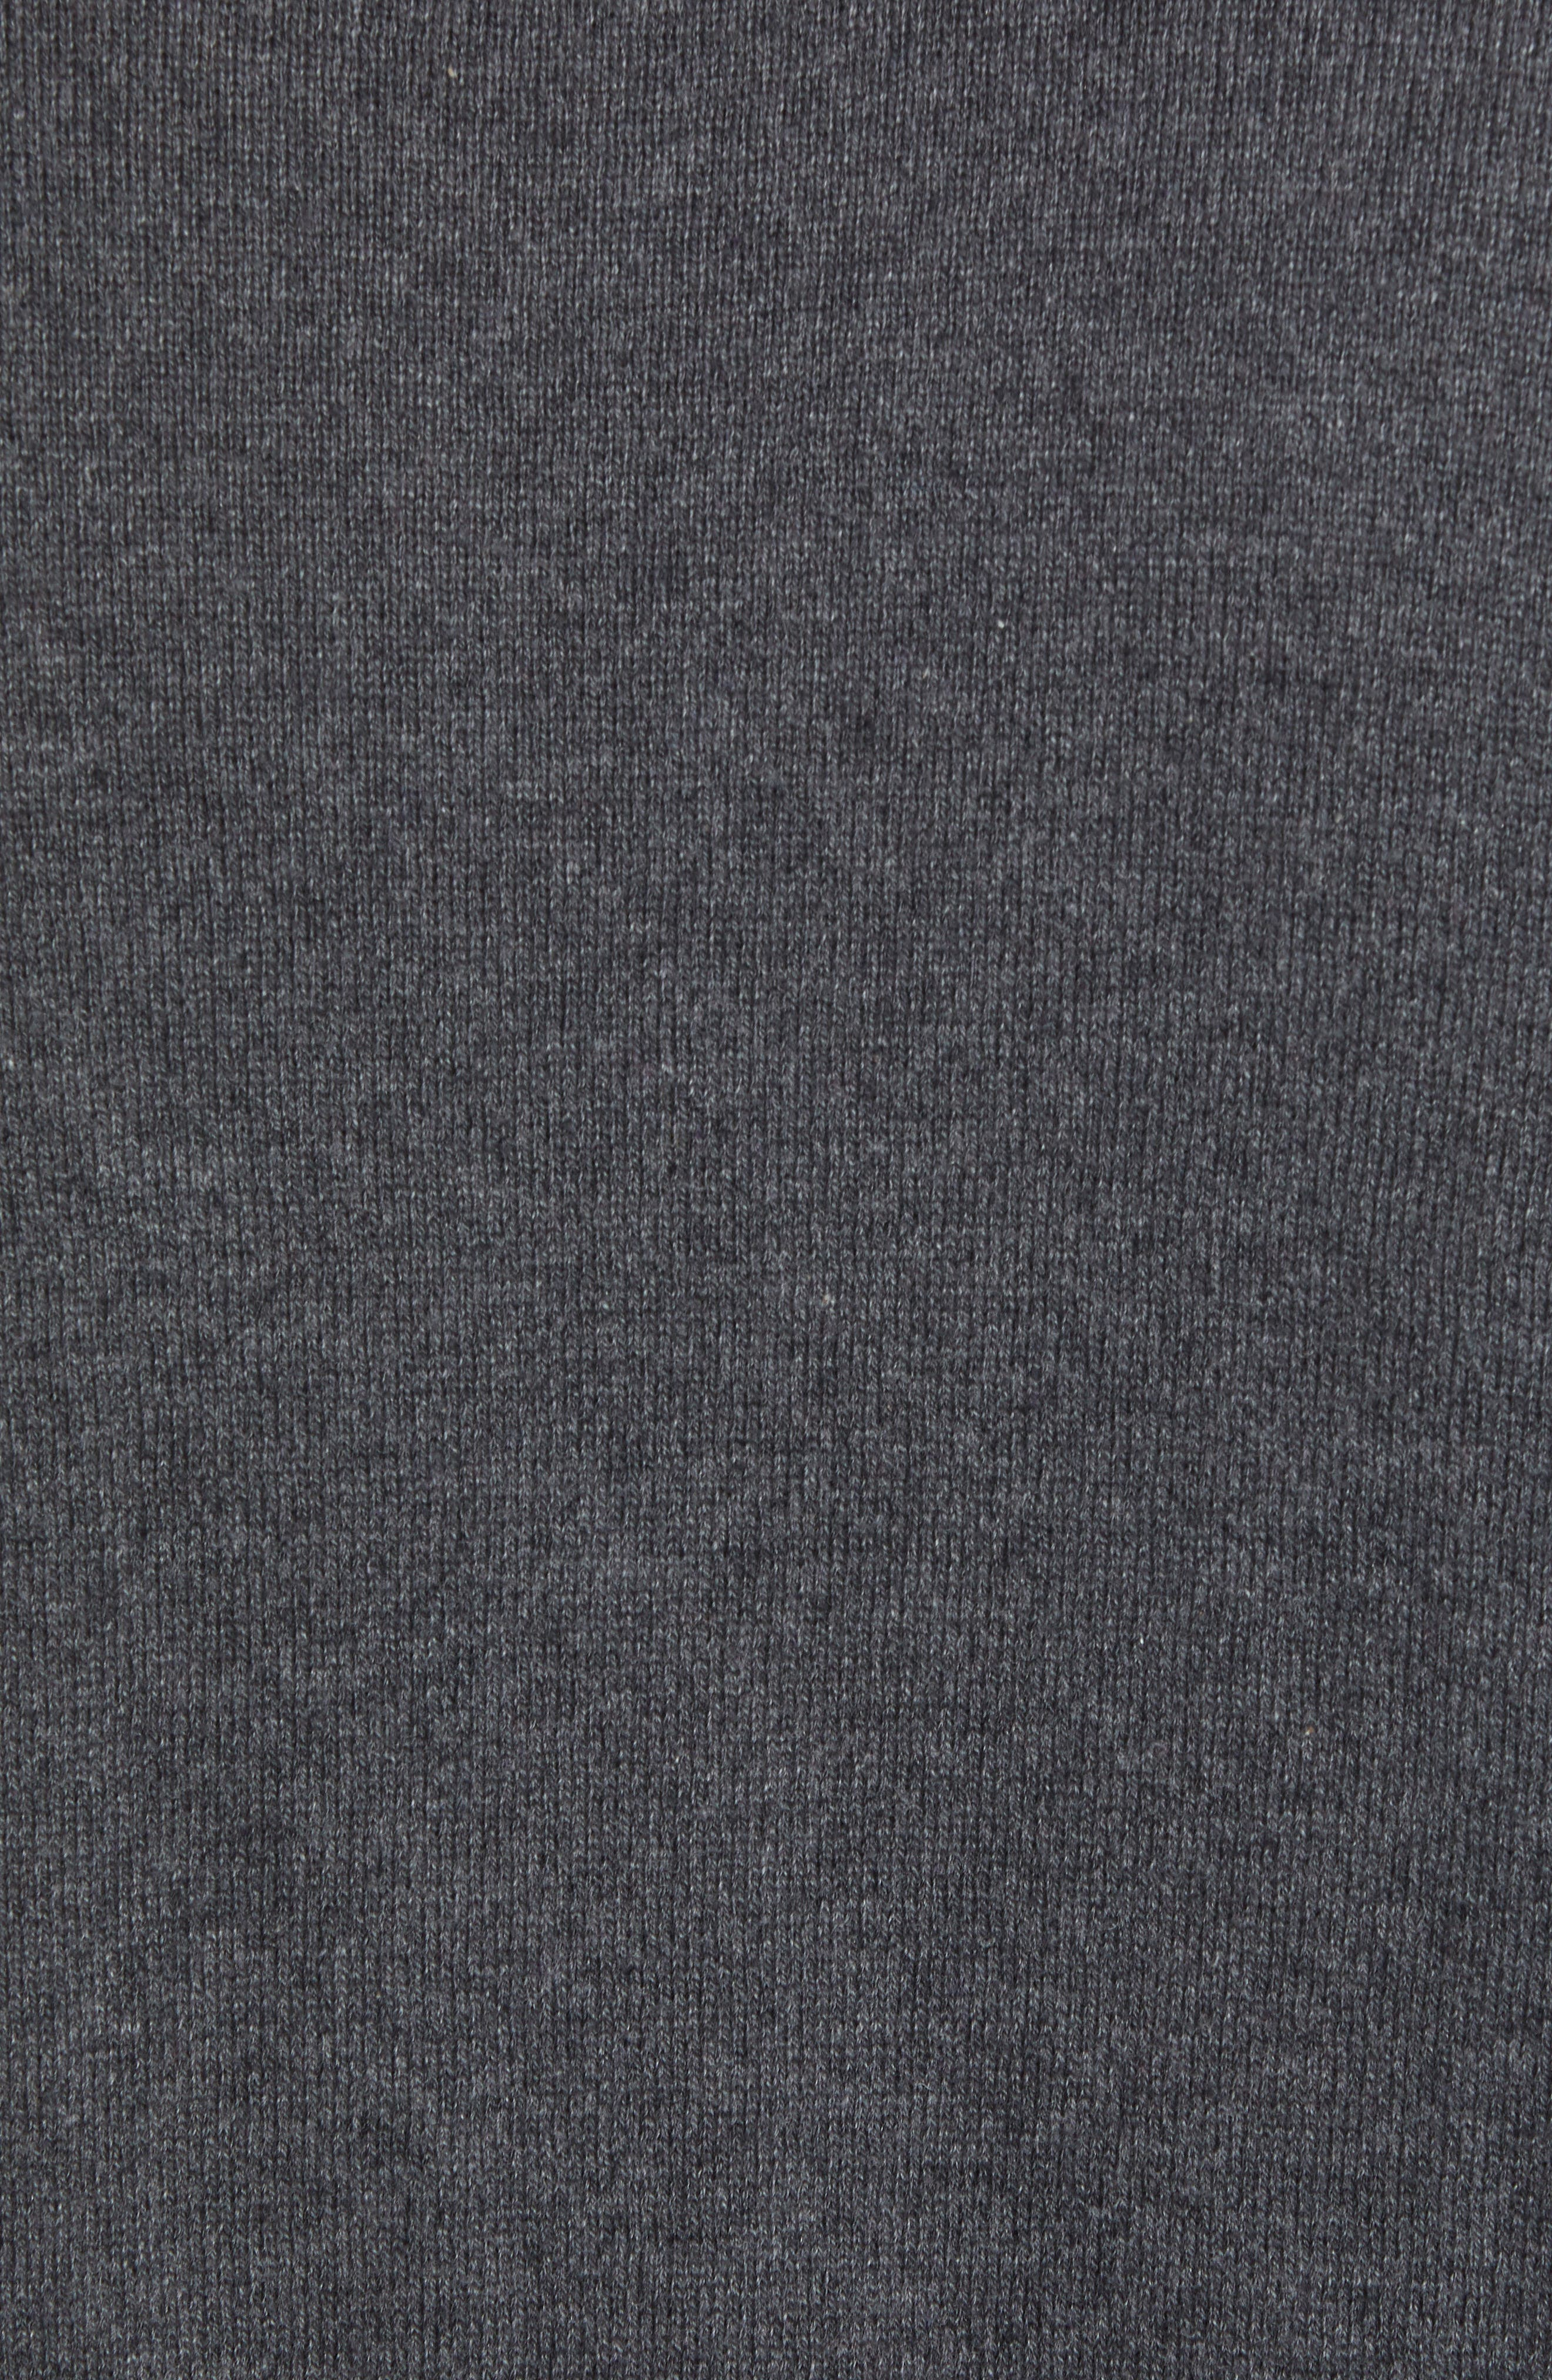 Tournament Slim Fit V-Neck Sweater,                             Alternate thumbnail 5, color,                             HEATHER CHARCOAL